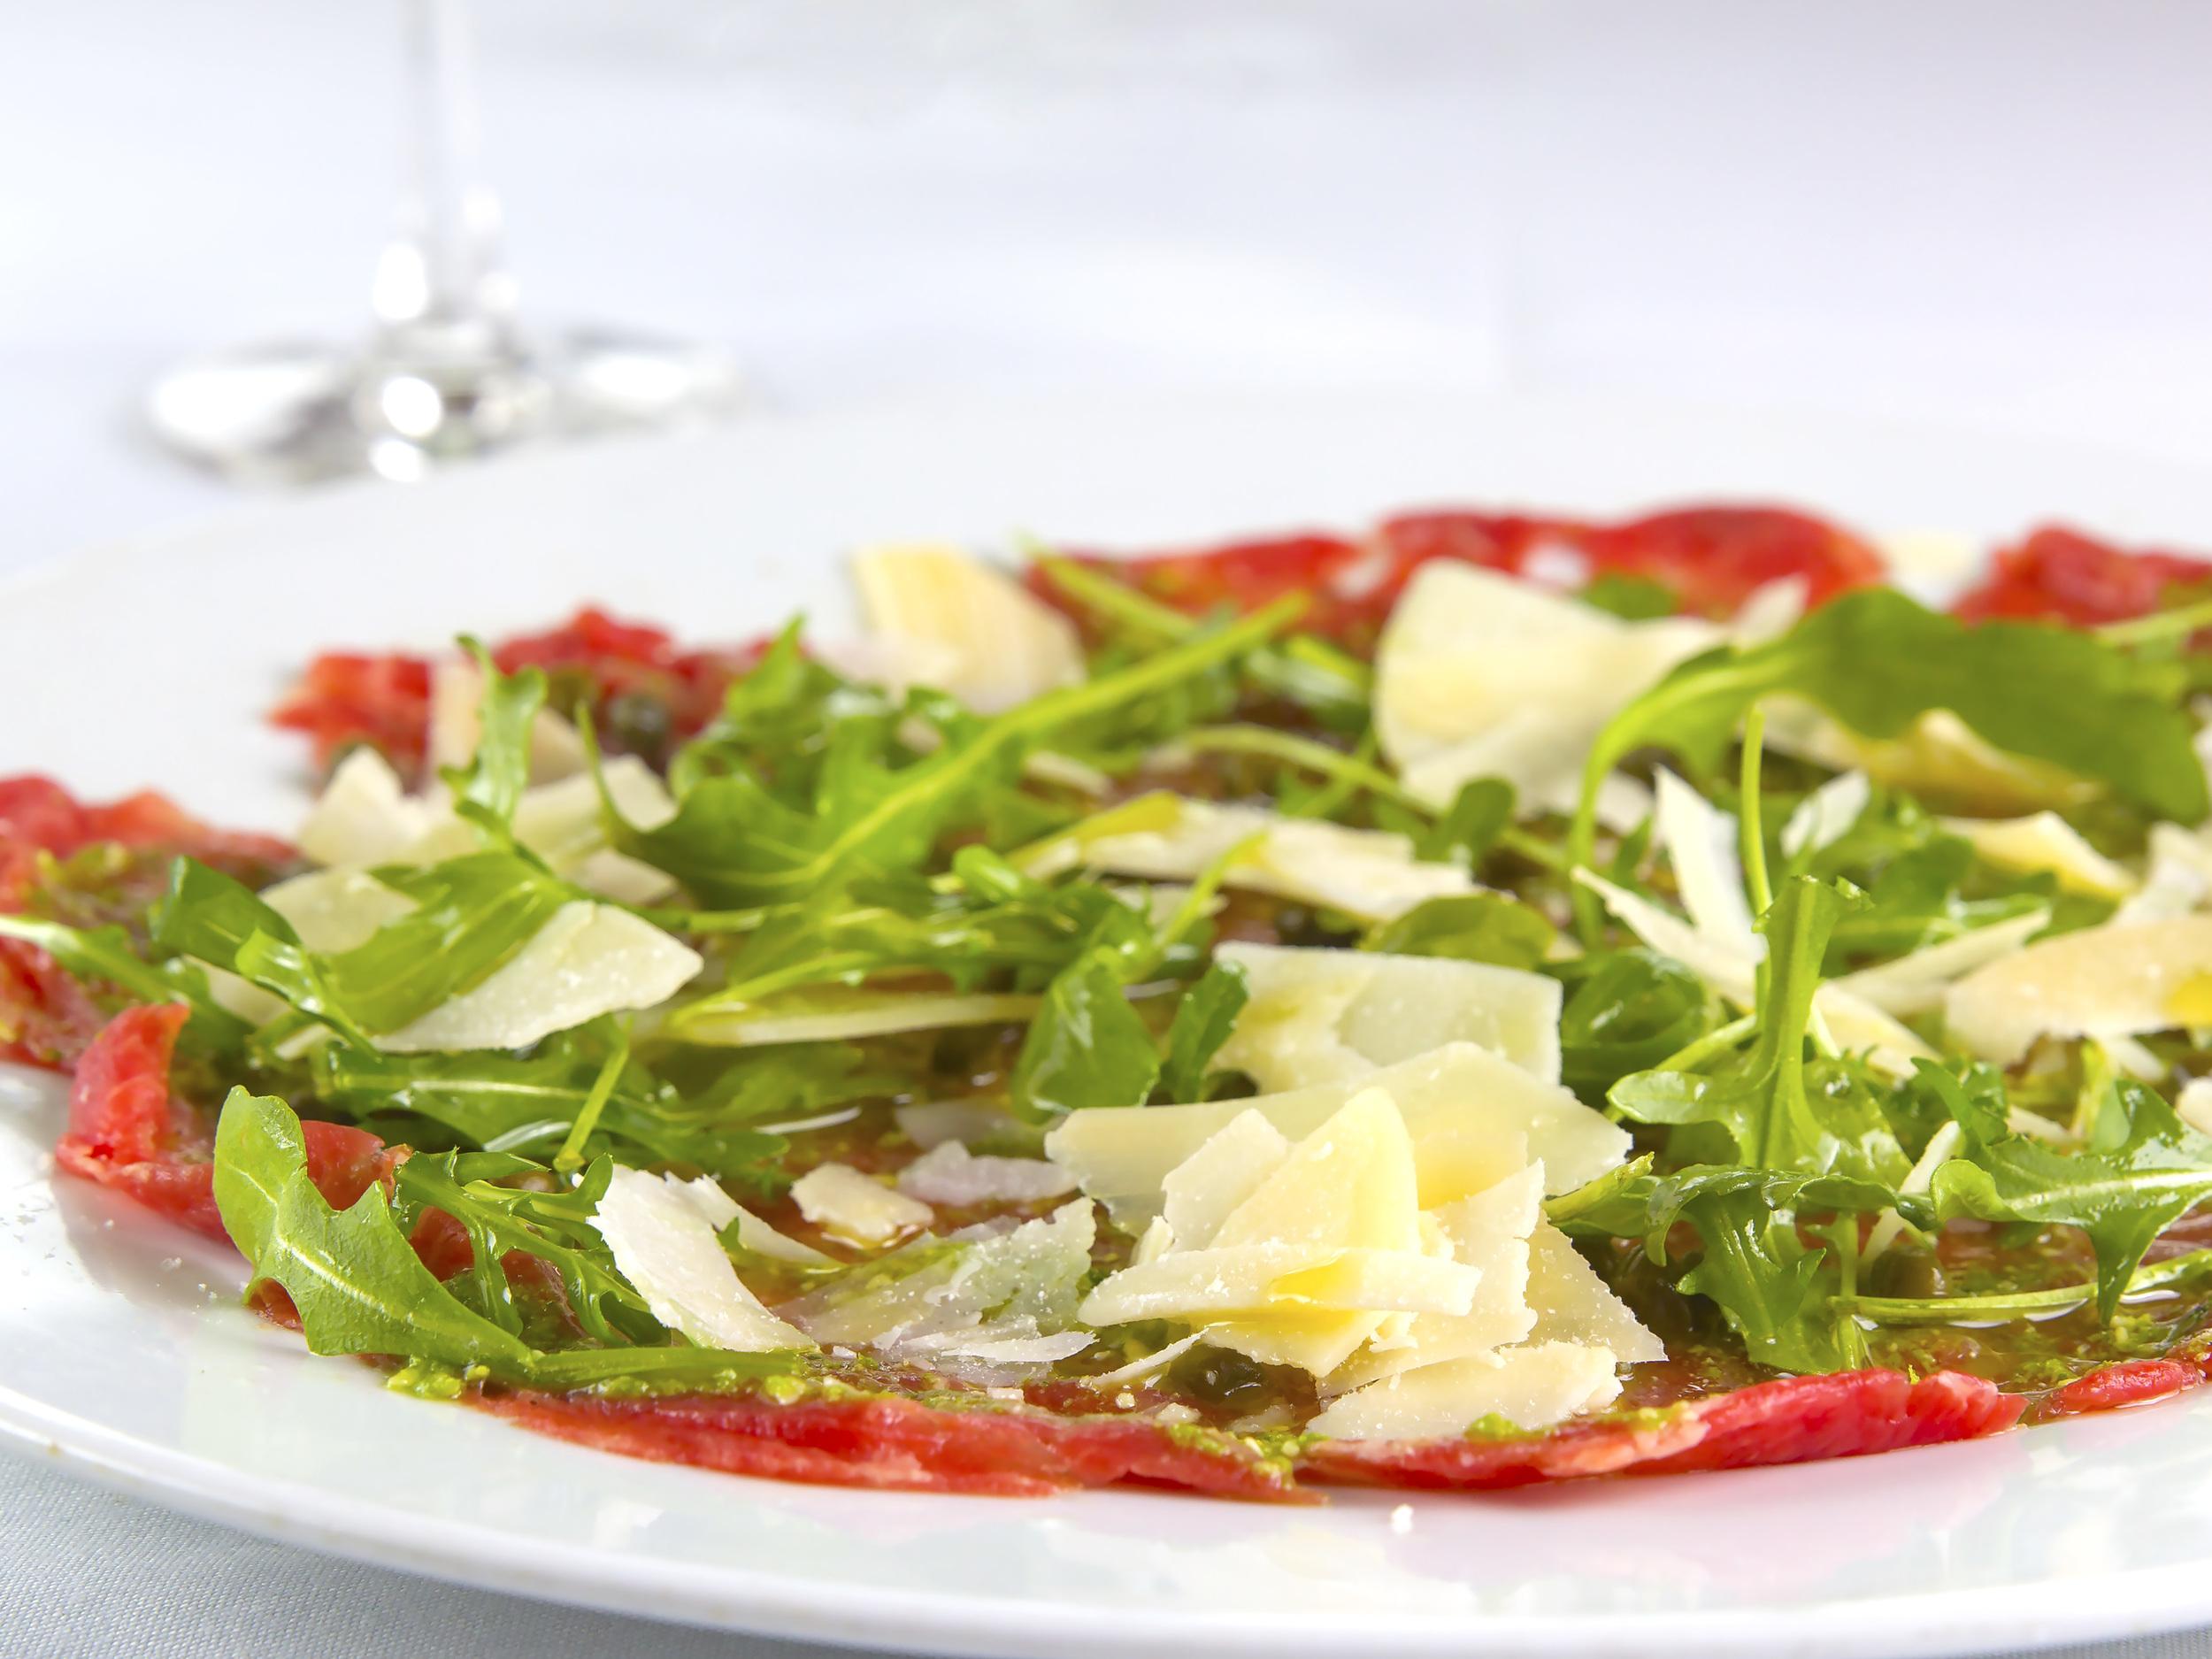 160121_Sperata_restaurant_food.0071.jpg